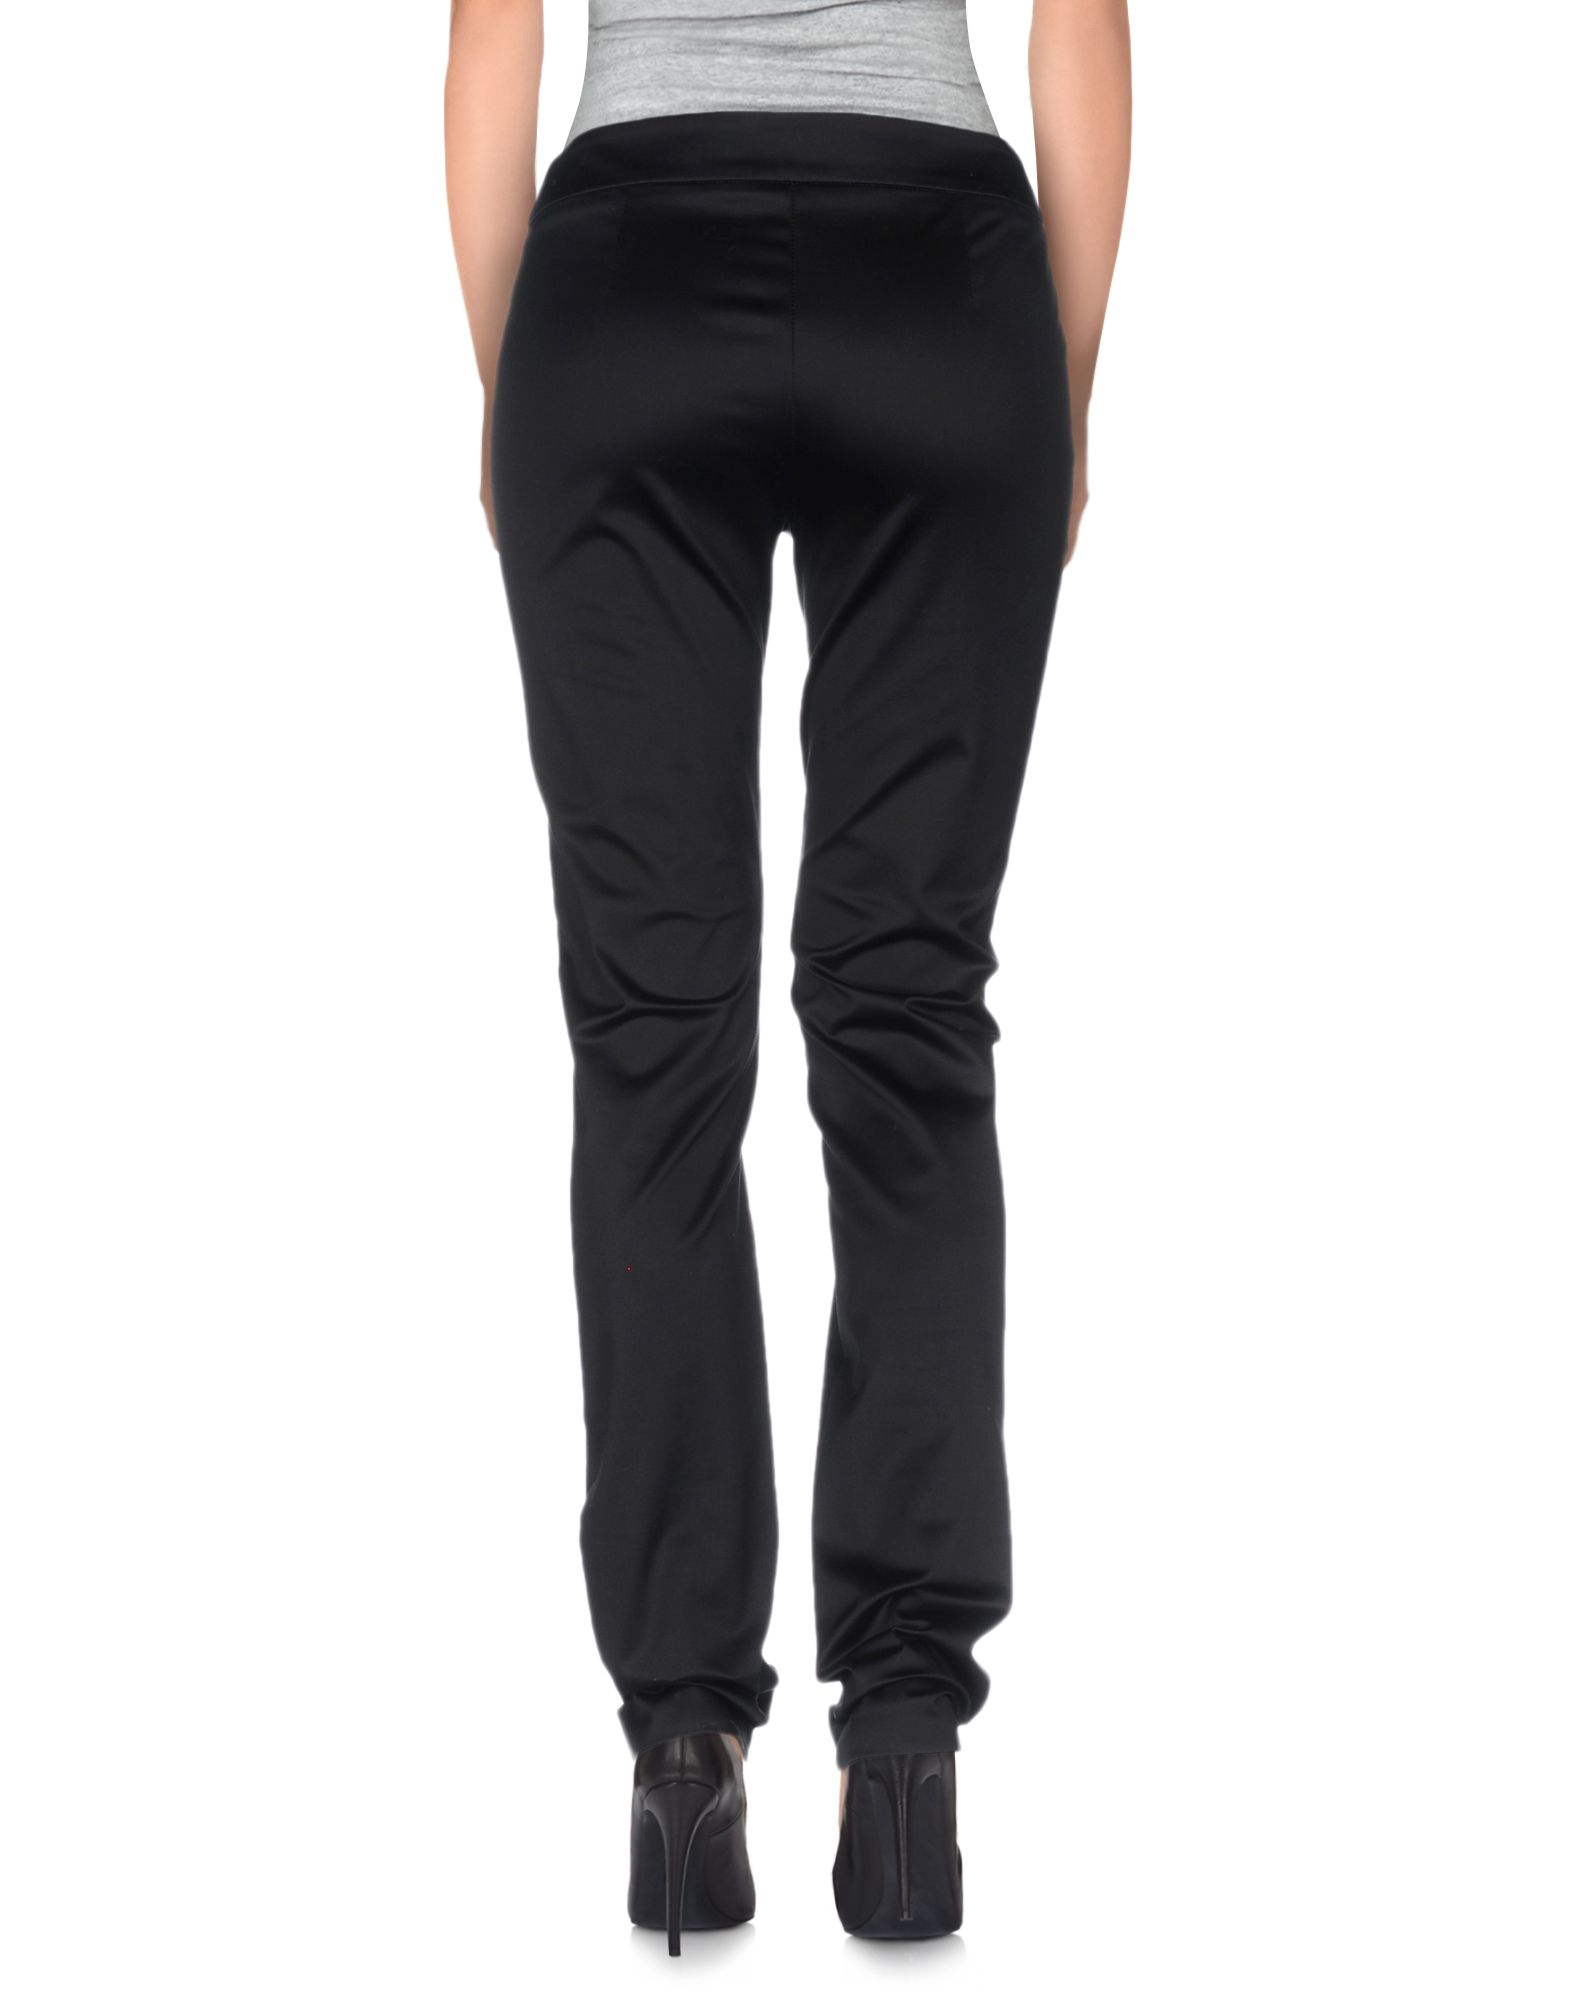 Popular Versace Jeans Women39s Black Casual Trouser